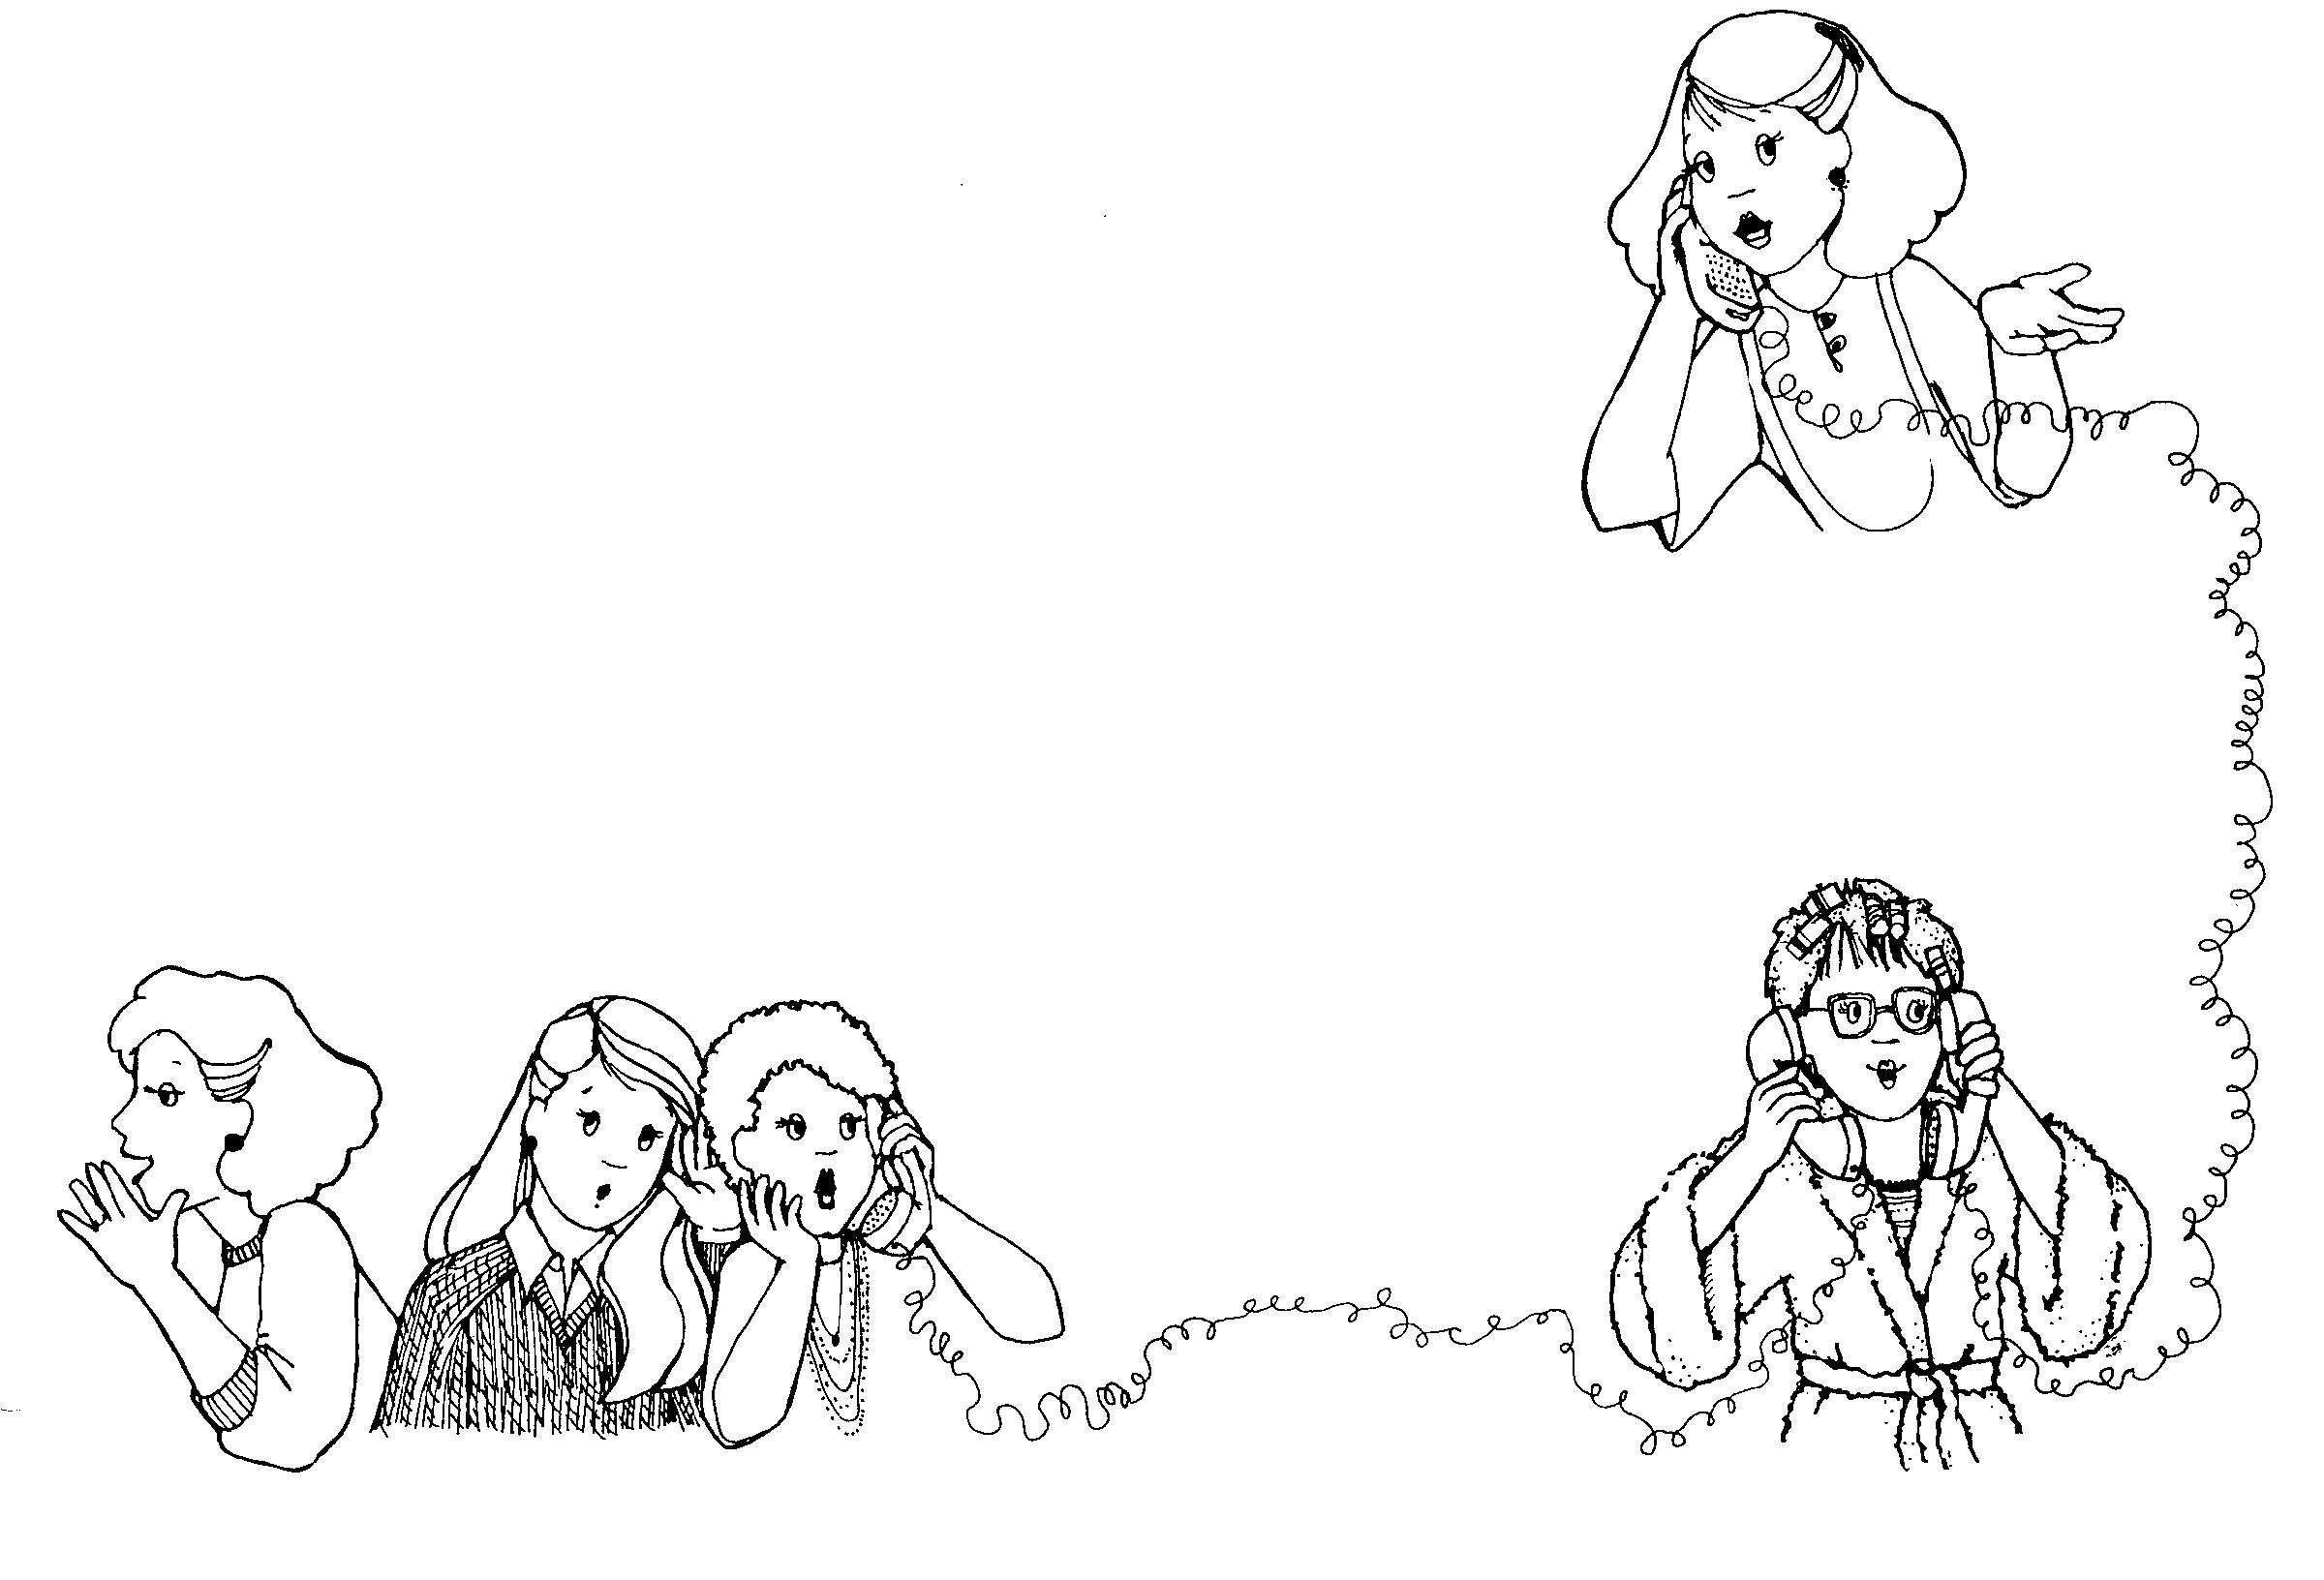 Free Gossip Cliparts, Download Free Clip Art, Free Clip Art.